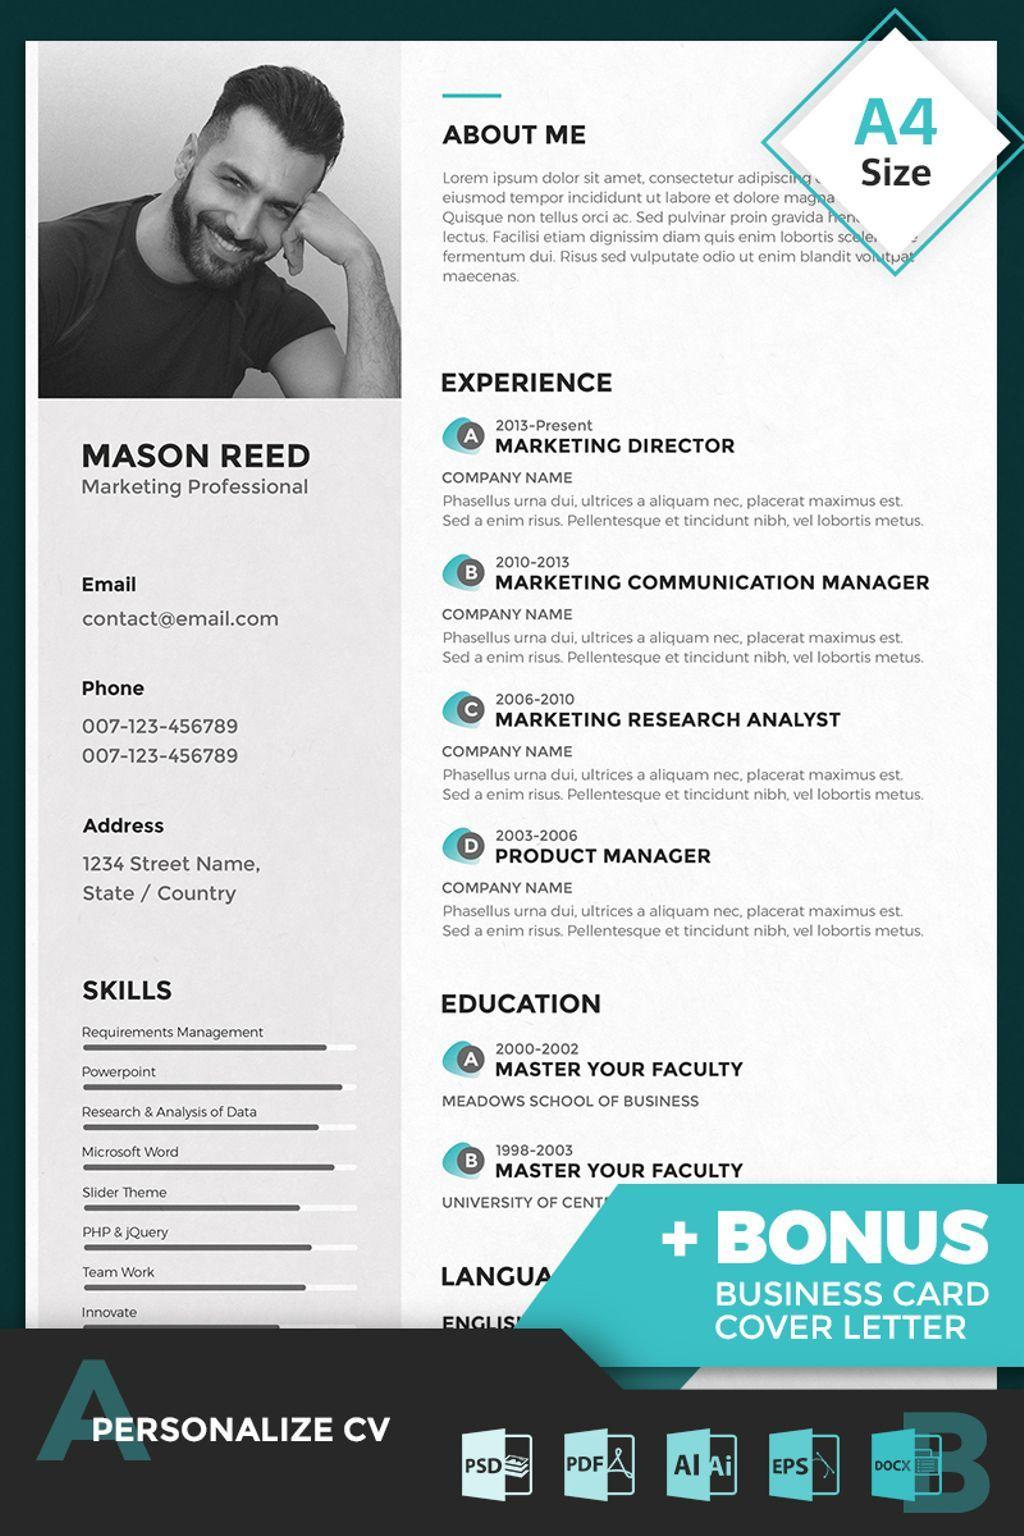 Proffesional Resume Mason Reed  Marketing Professional Resume Template  Professional .